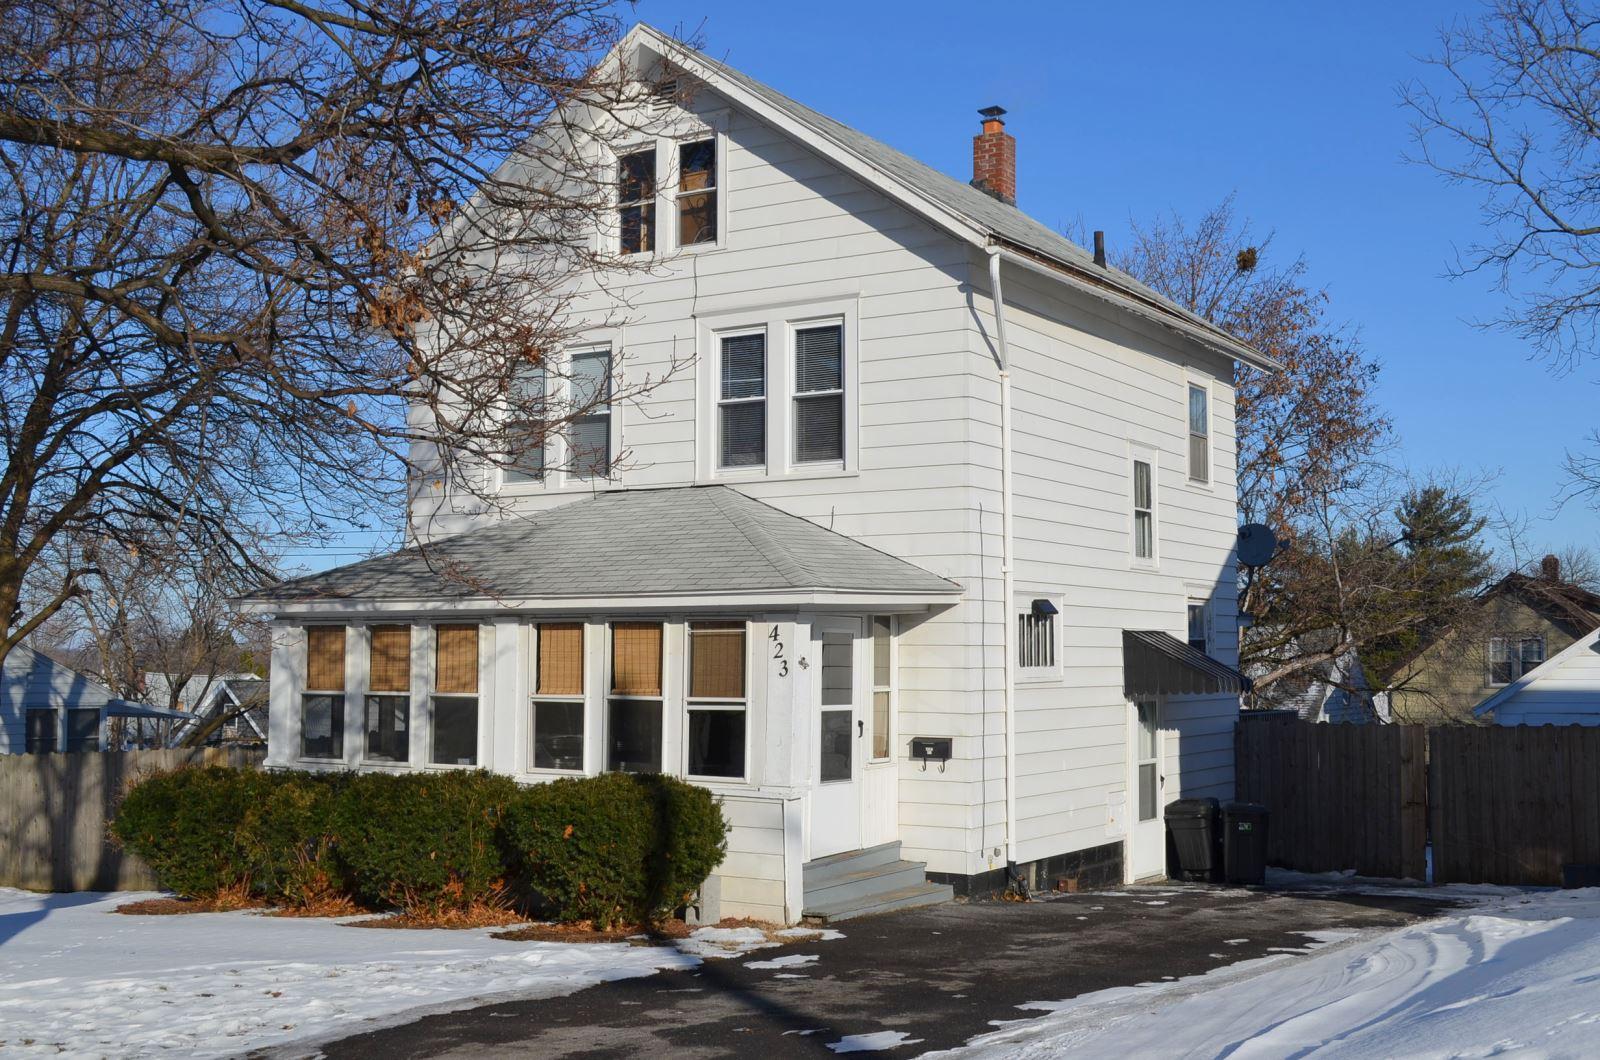 Syracuse, NY Real Estate & Homes for Sale - realtor.com